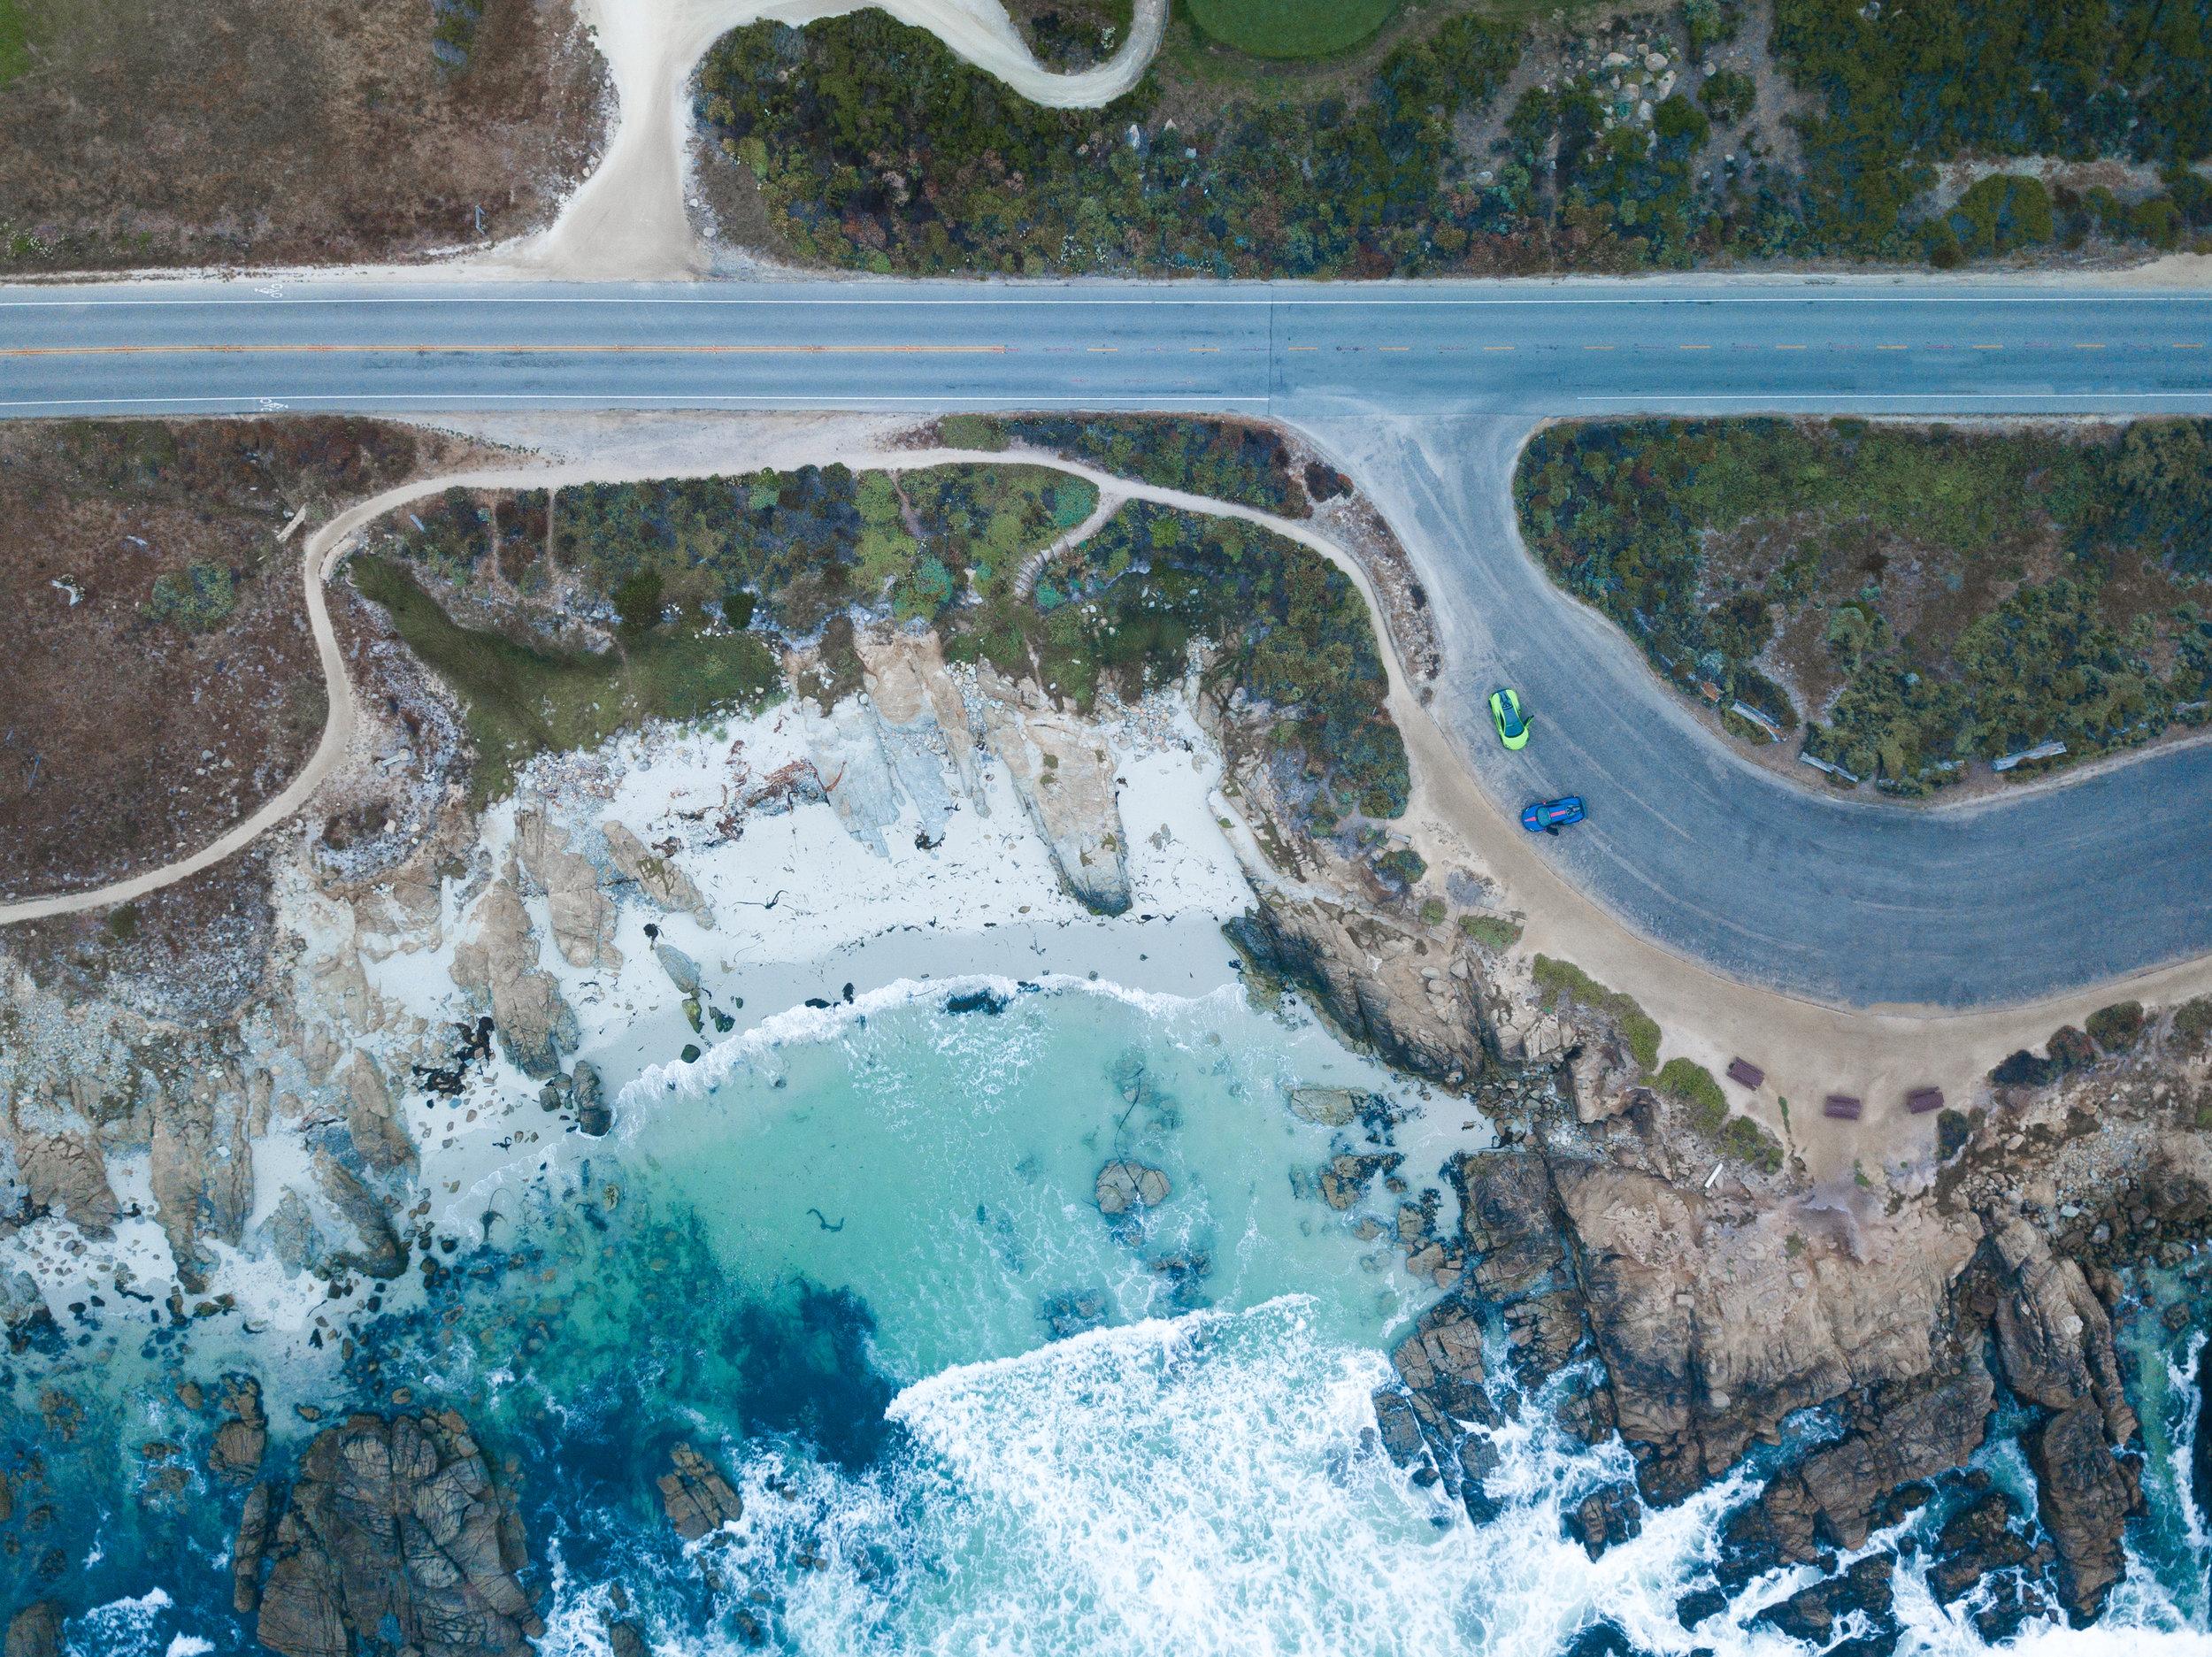 Stay_Driven_Monterey_Mclarens_DRONE-16.jpg